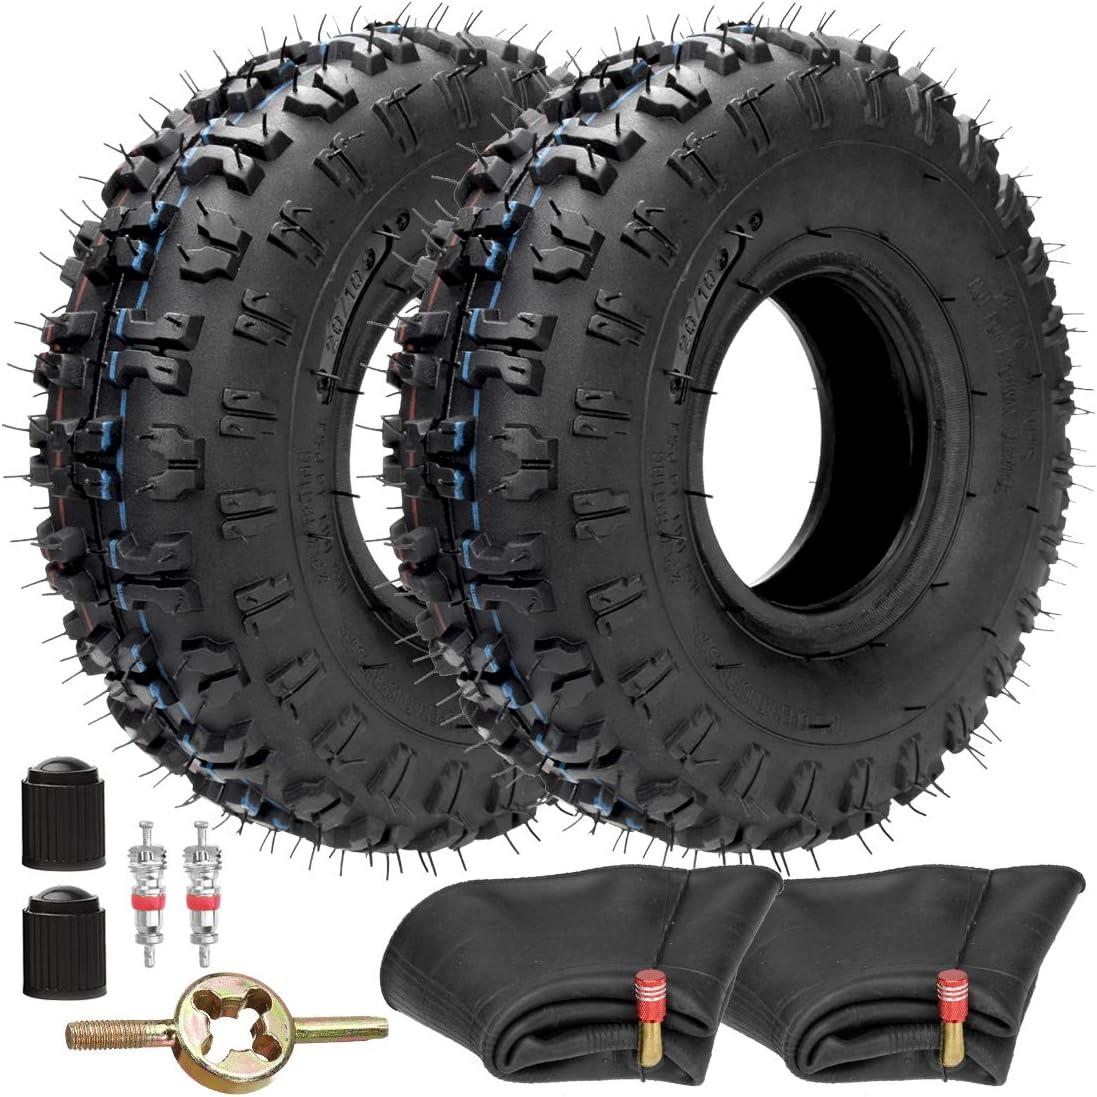 FVRITO 2 Pack of 4.10-4 410-4 4.10/3.50-4 Tire with Inner Tube for Lawn Mowers Garden Rototiller Snow Blower Mowers Hand Truck Wheelbarrow Go Cart Kid ATV